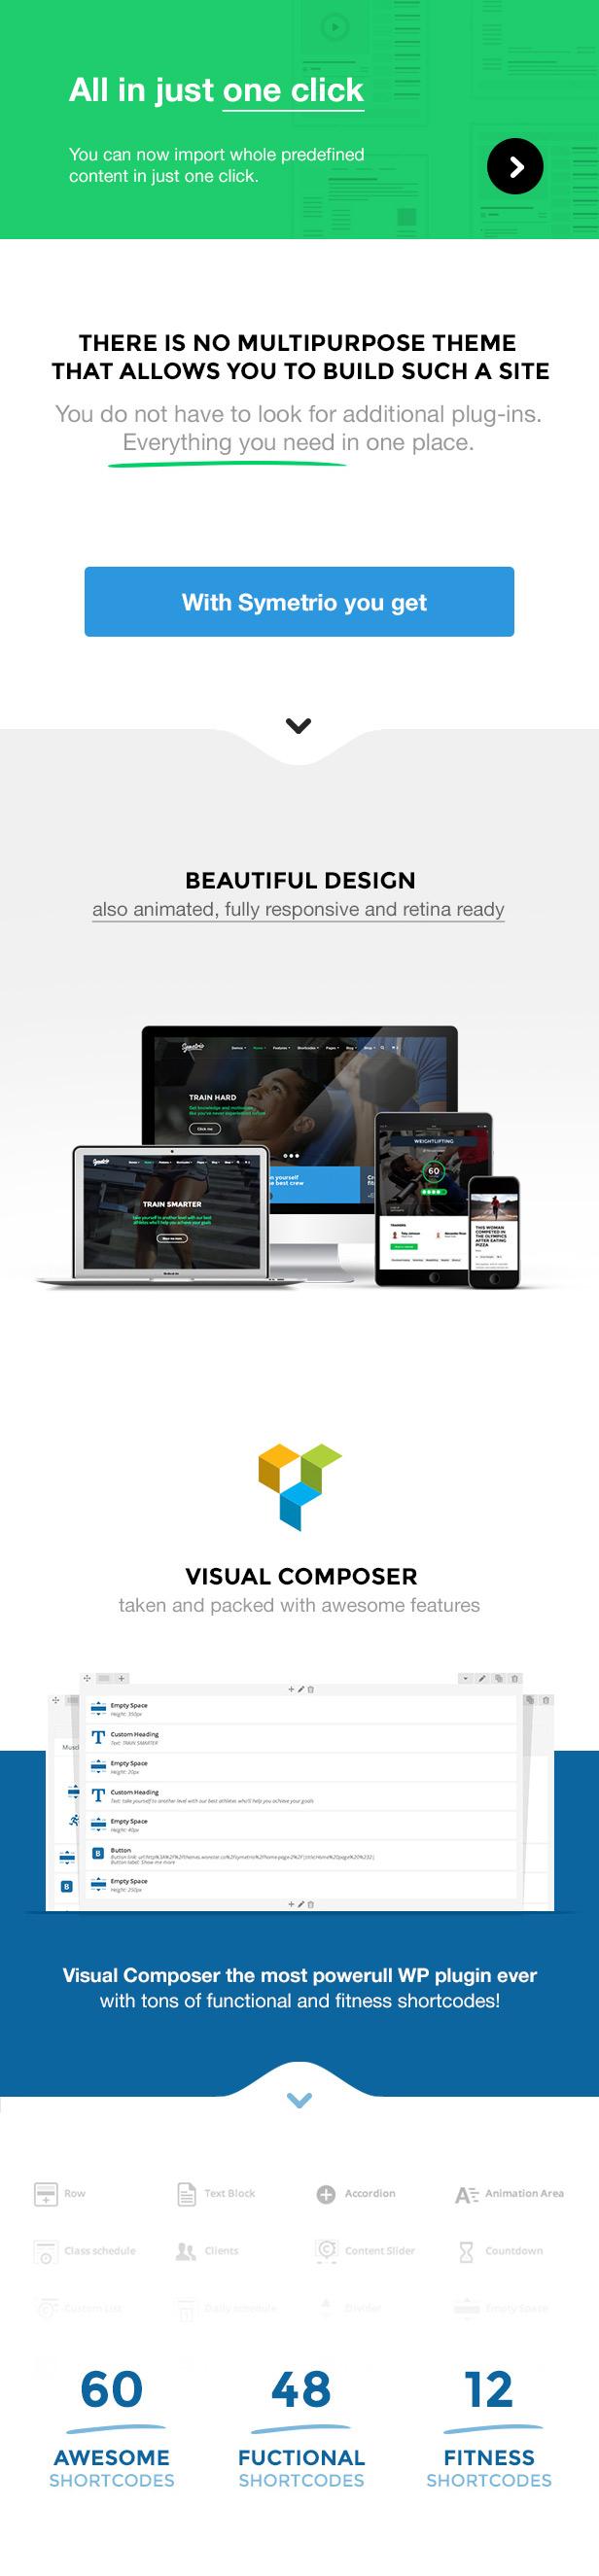 Symetrio - Gym & Fitness WordPress Theme - 2